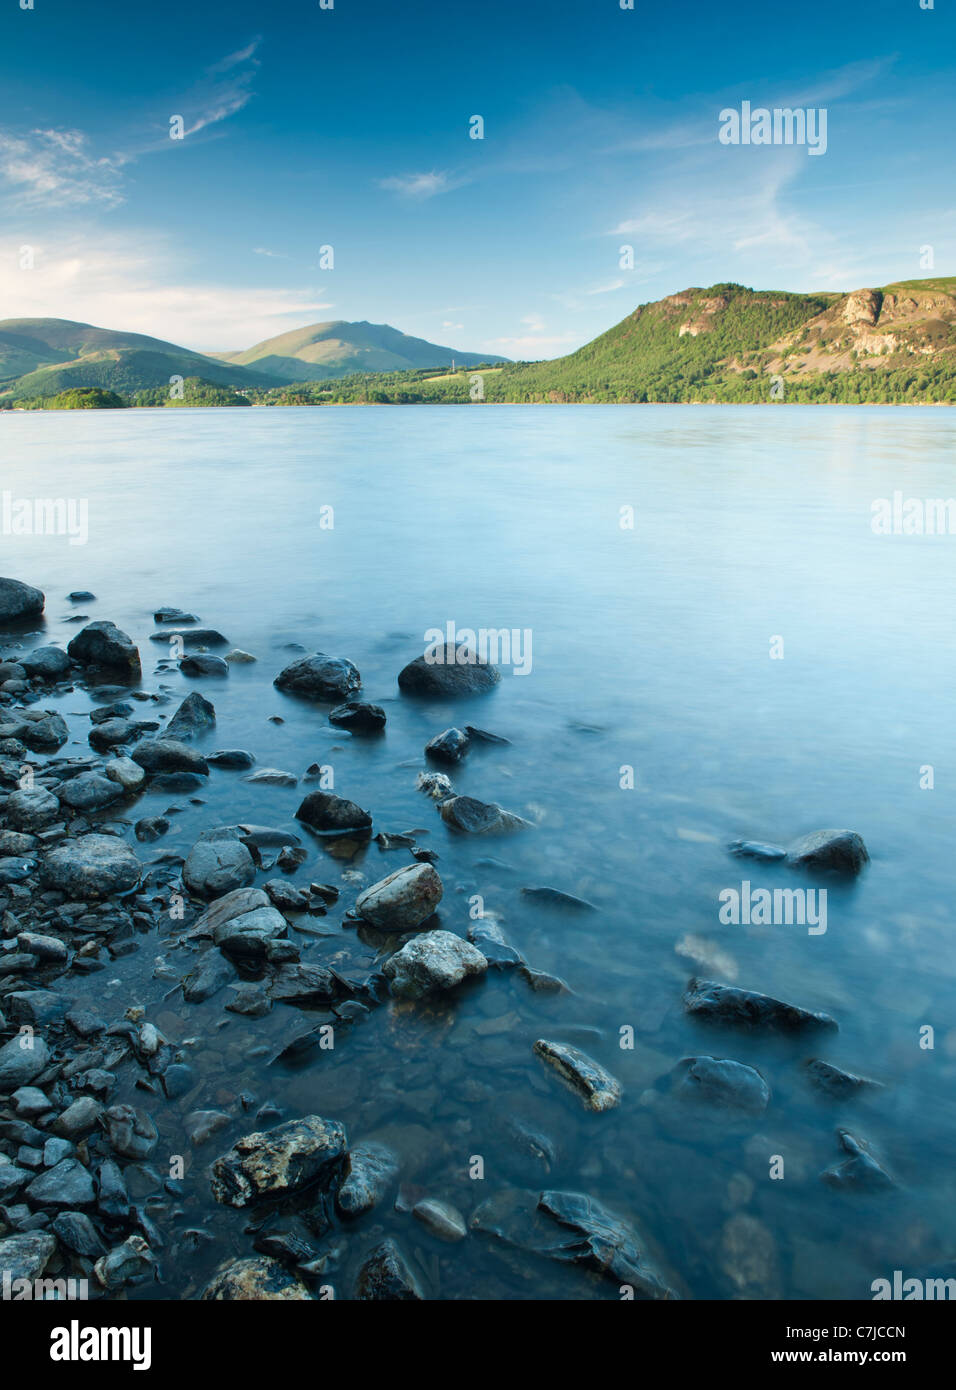 Rocks on the lake shore, Brandelhow Bay, Lake District, Cumbria, UK - Stock Image